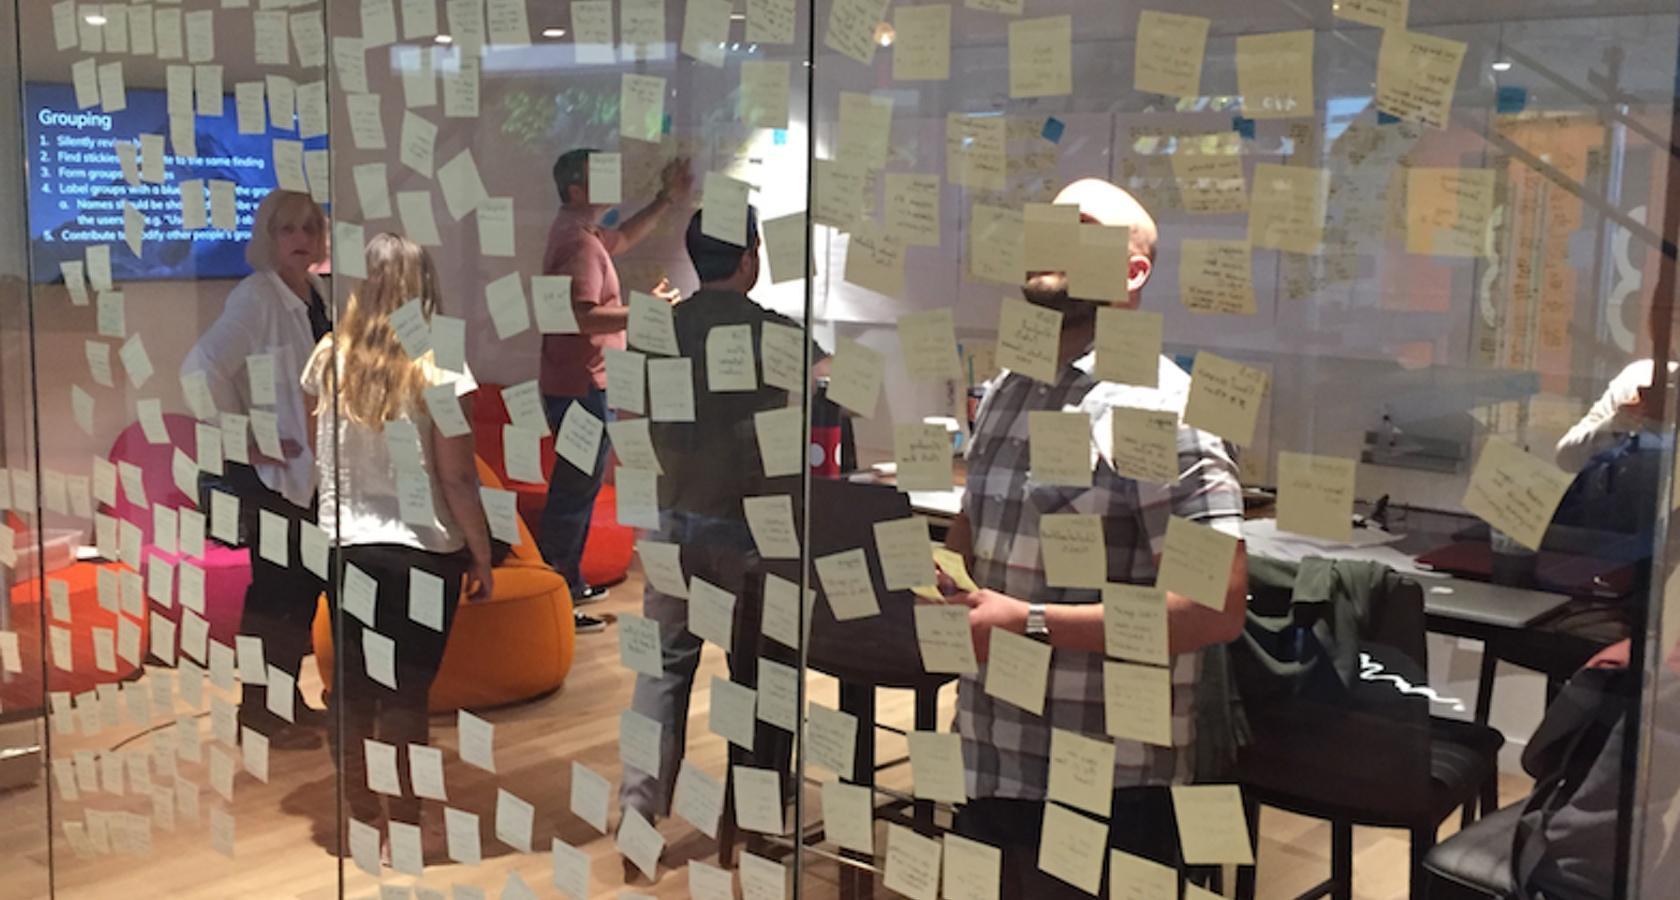 Design thinking ideation process